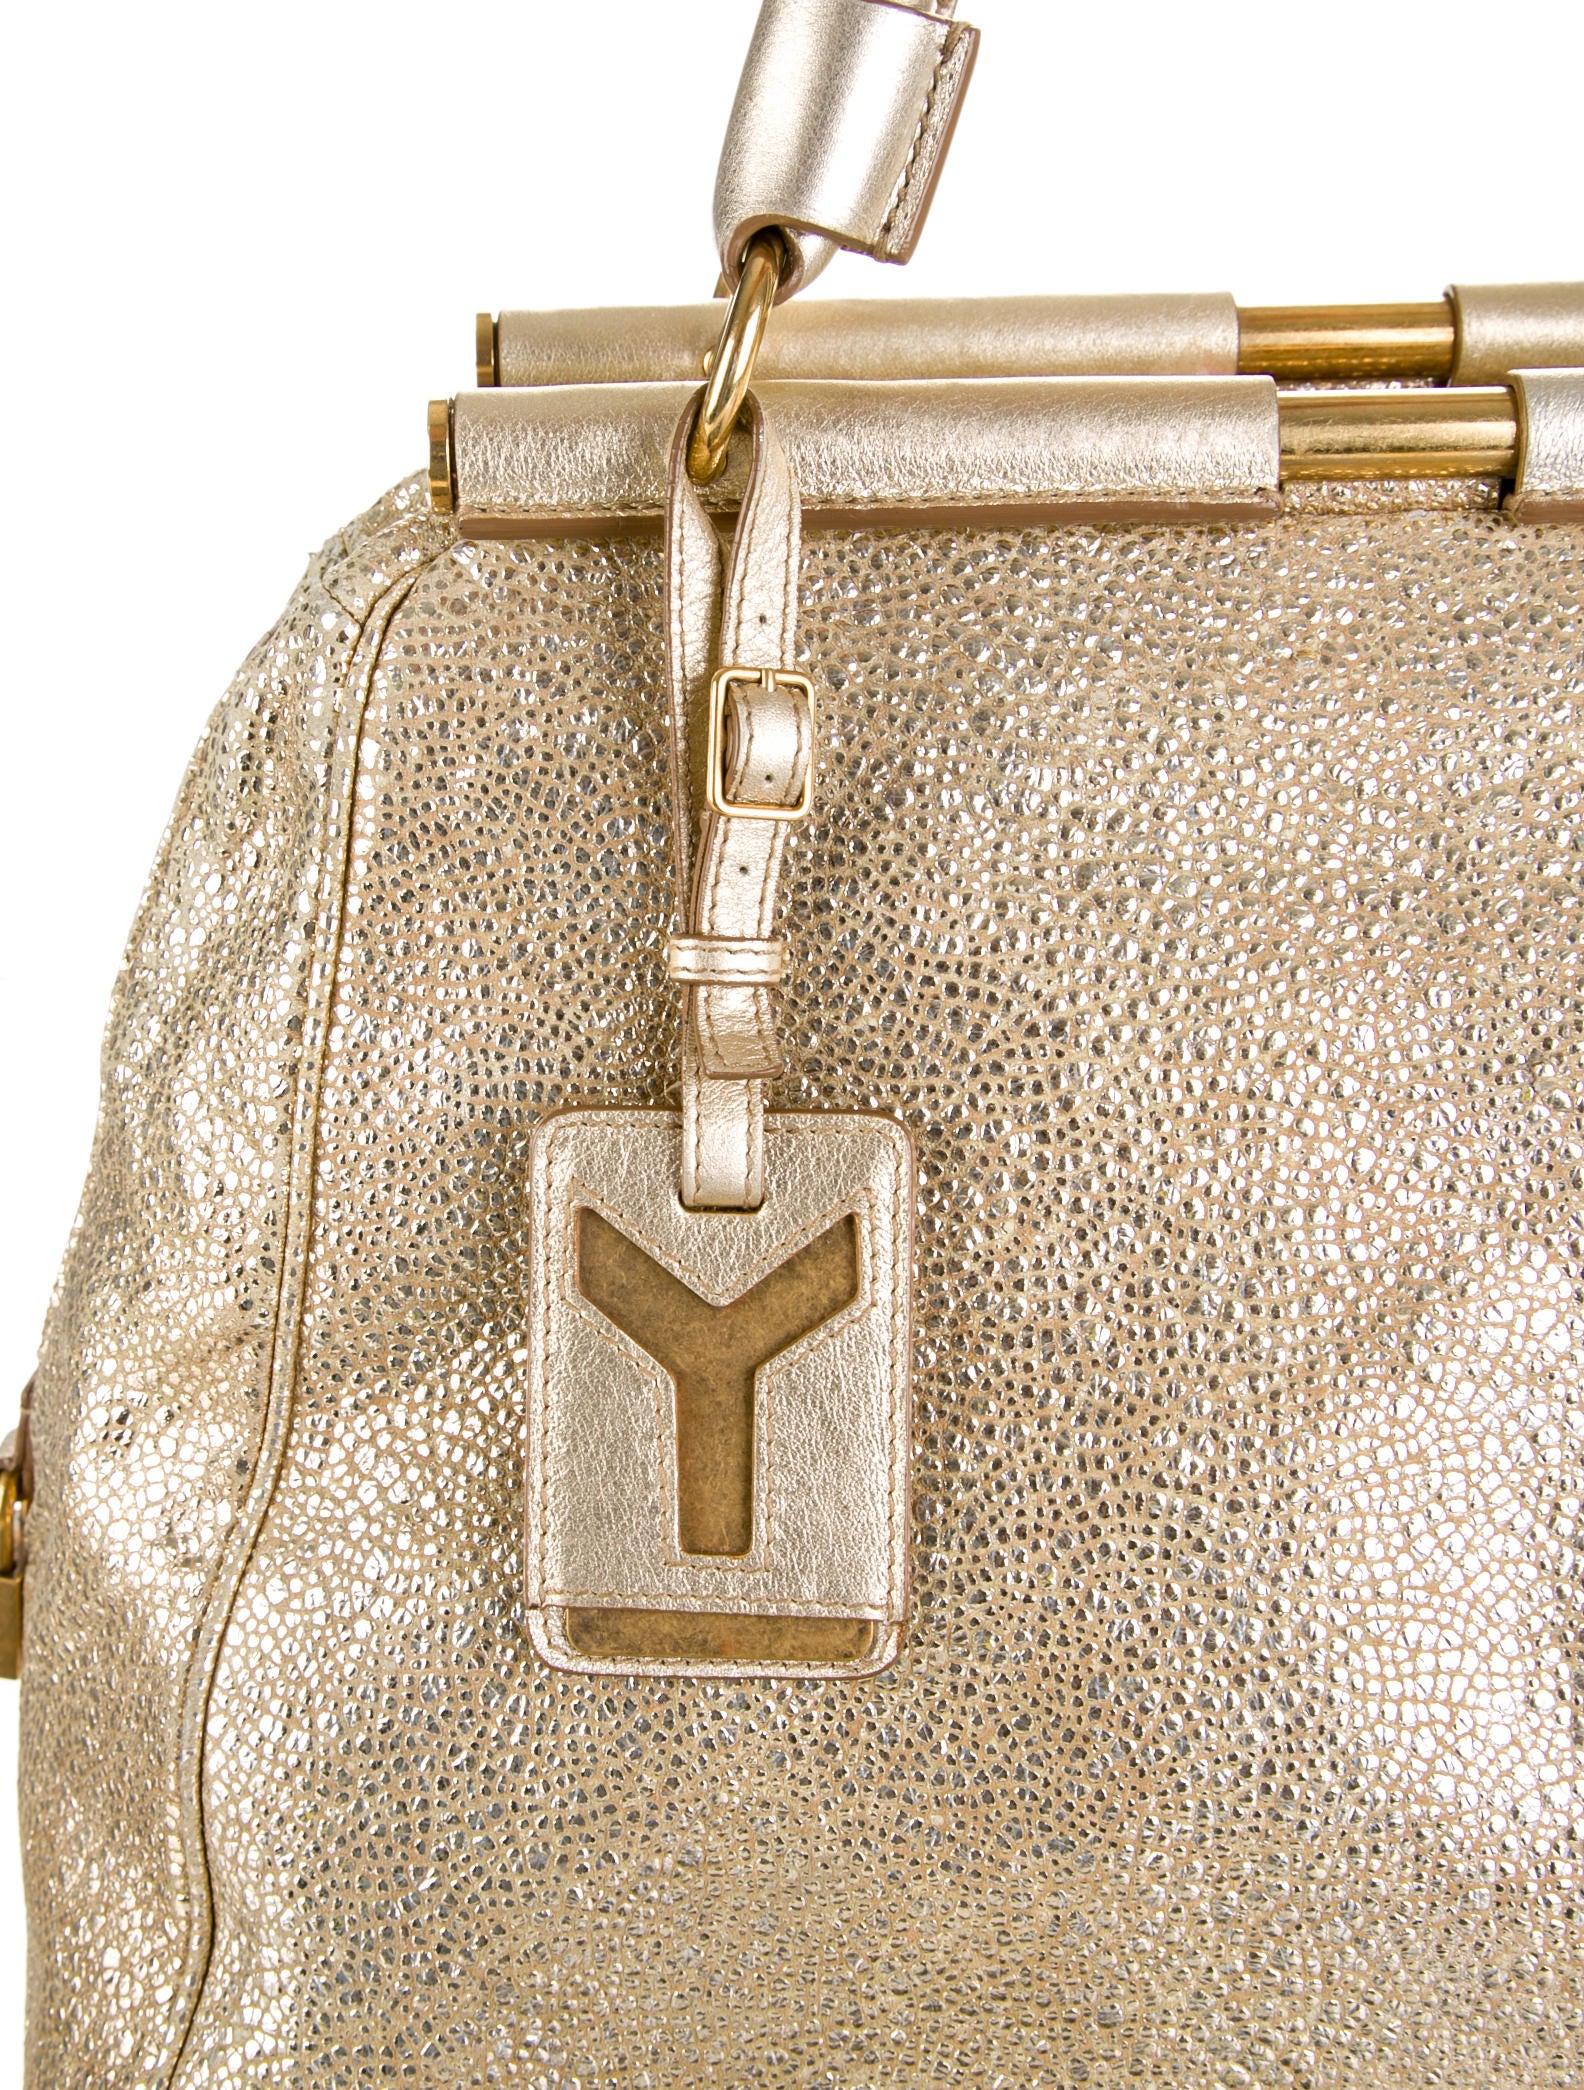 ysl prices - Yves Saint Laurent Majorelle Bag - Handbags - YVE32002 | The RealReal